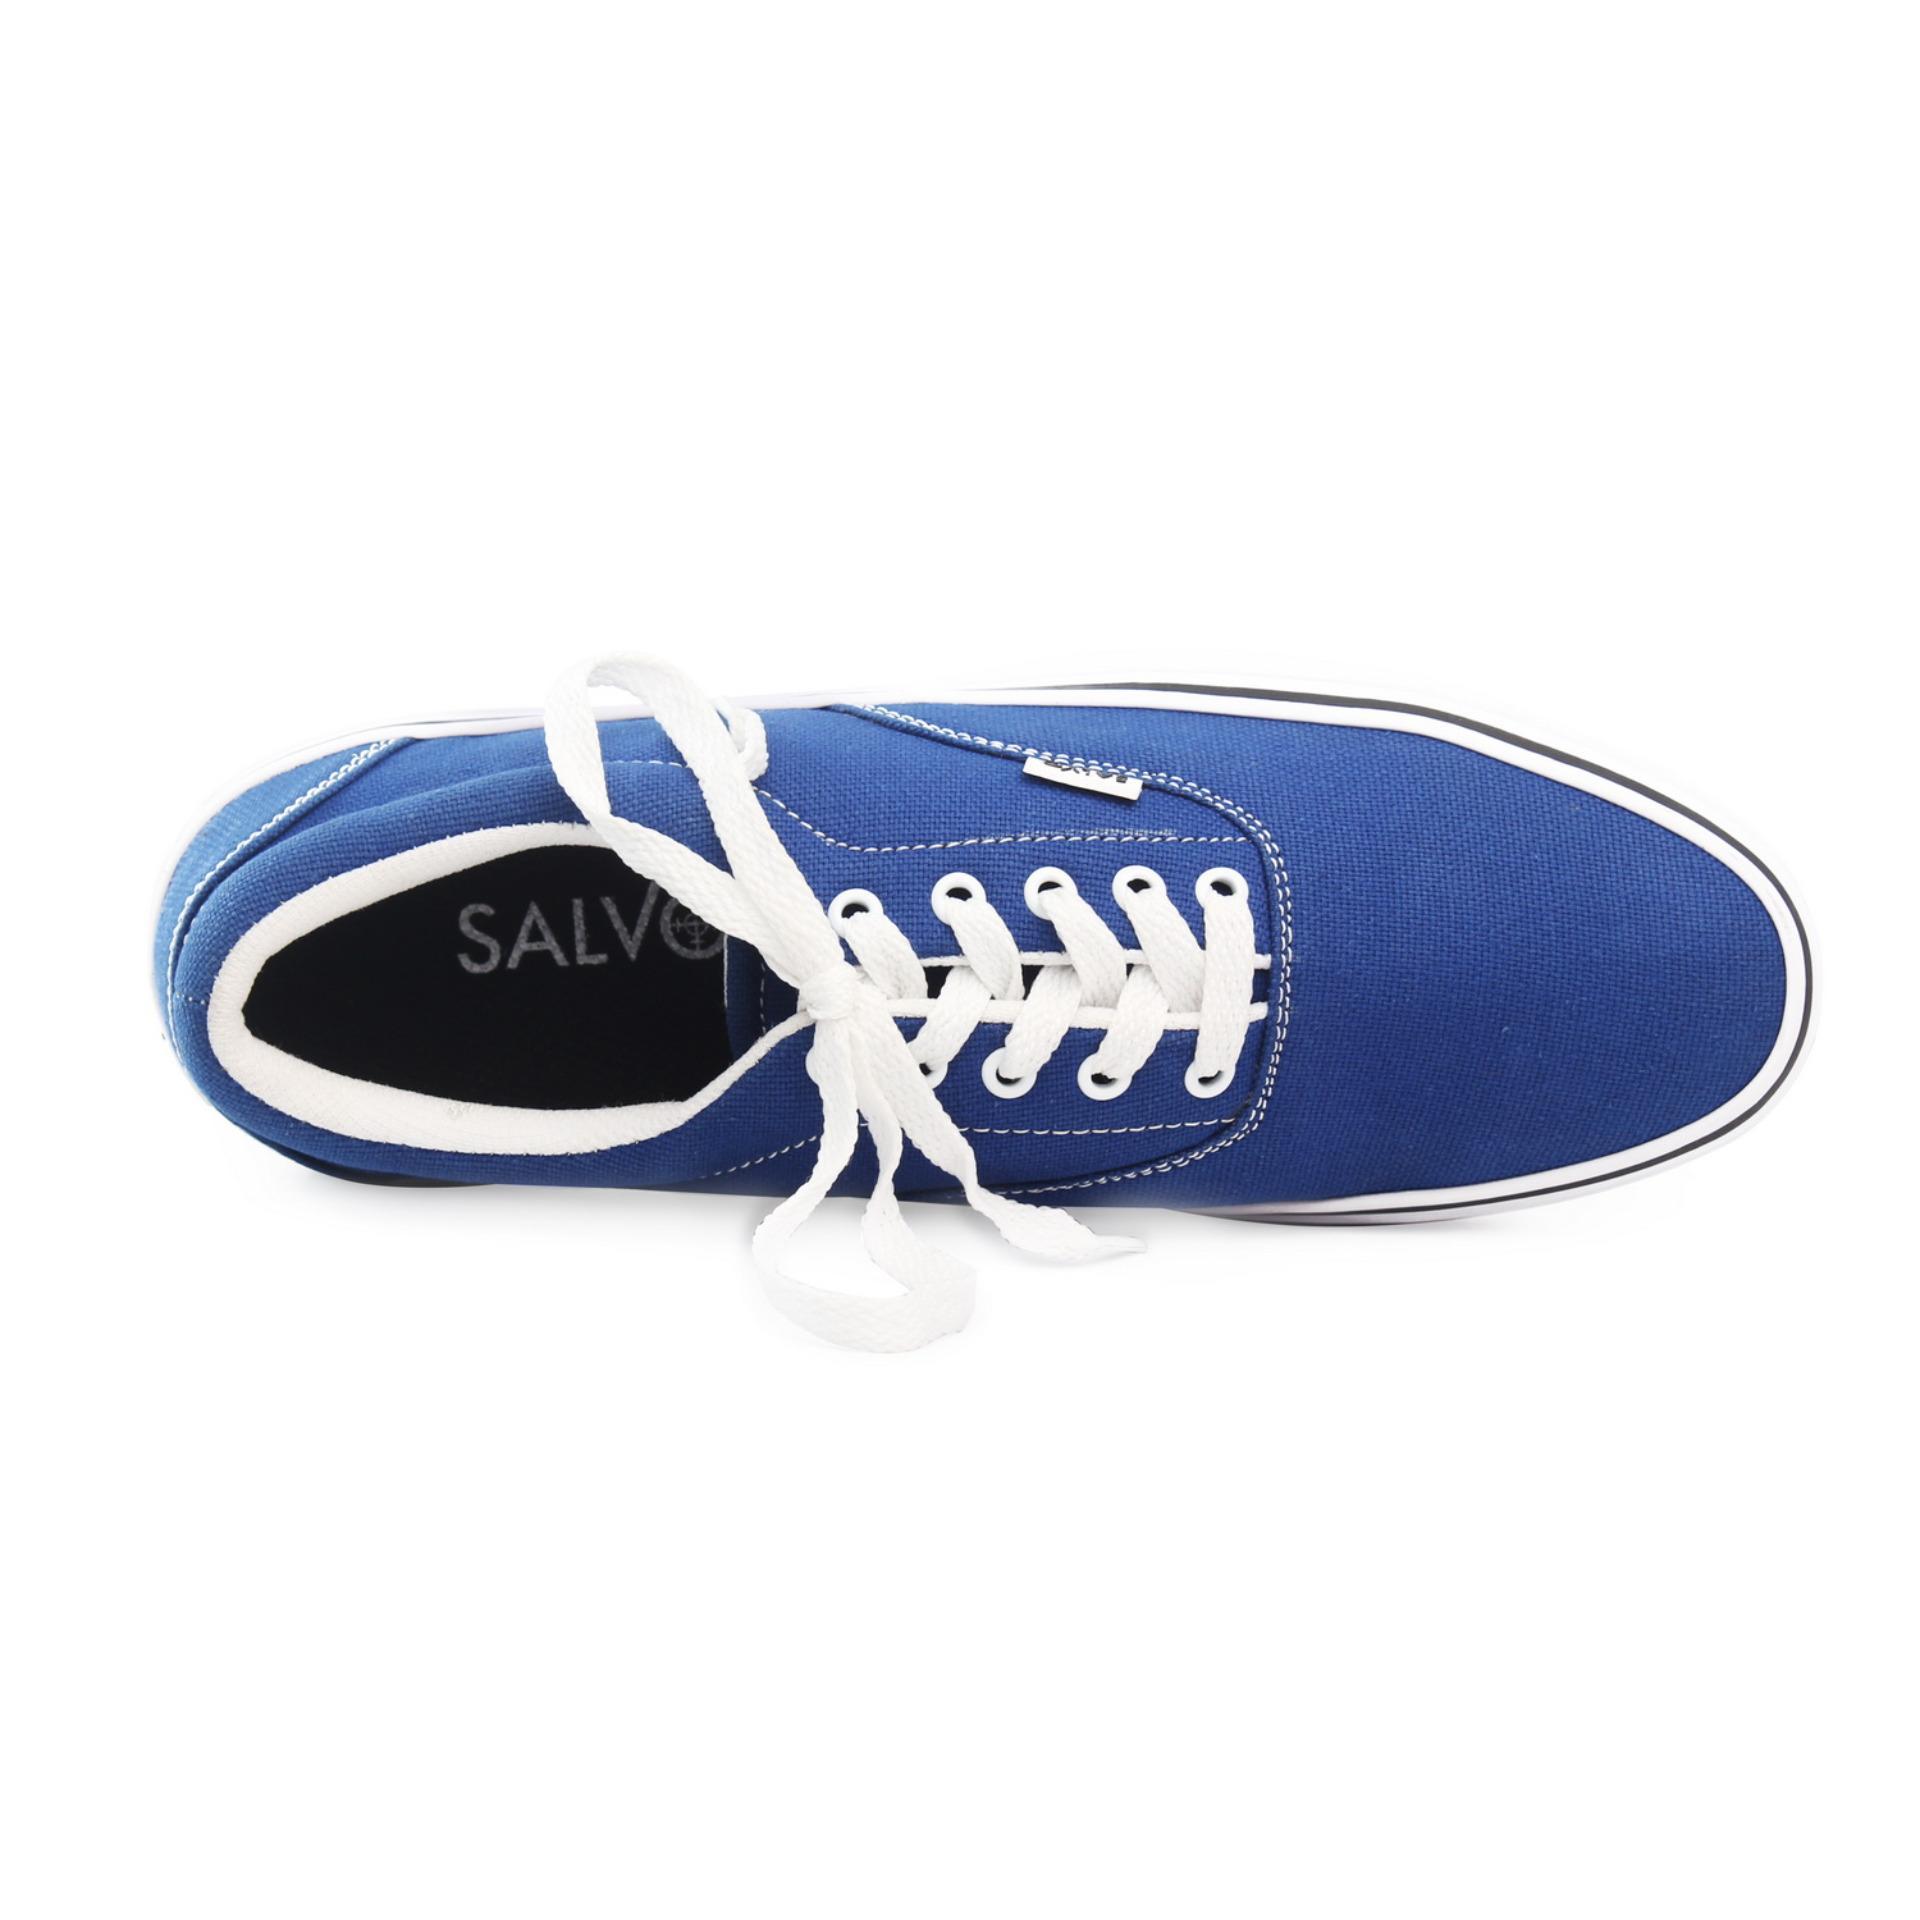 Diskon Penjualan Salvo sepatu sneaker pria A03-Biru Harga Termurah f1956557b2